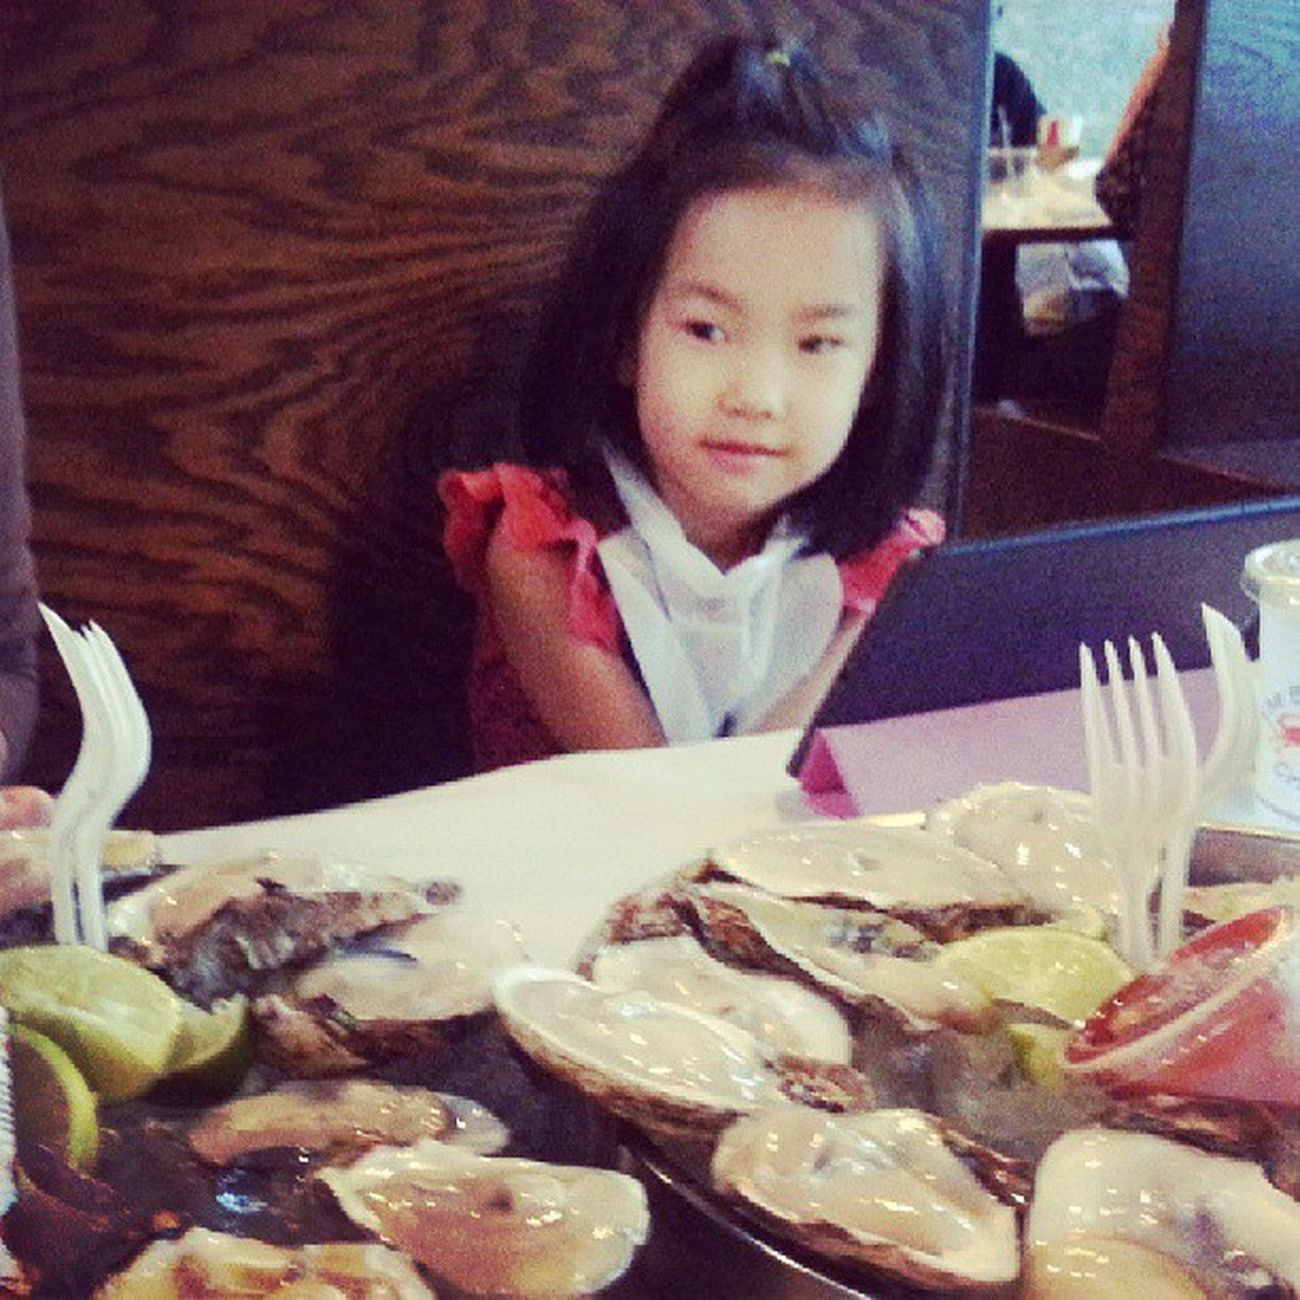 ♥♡♥♡ Instalike Instagram Ipadbaby SushiCute FourByAll iAmViet iAmGame VegasStyle Vegas LasVegas wannabecoonass cajun oyster onVNtime